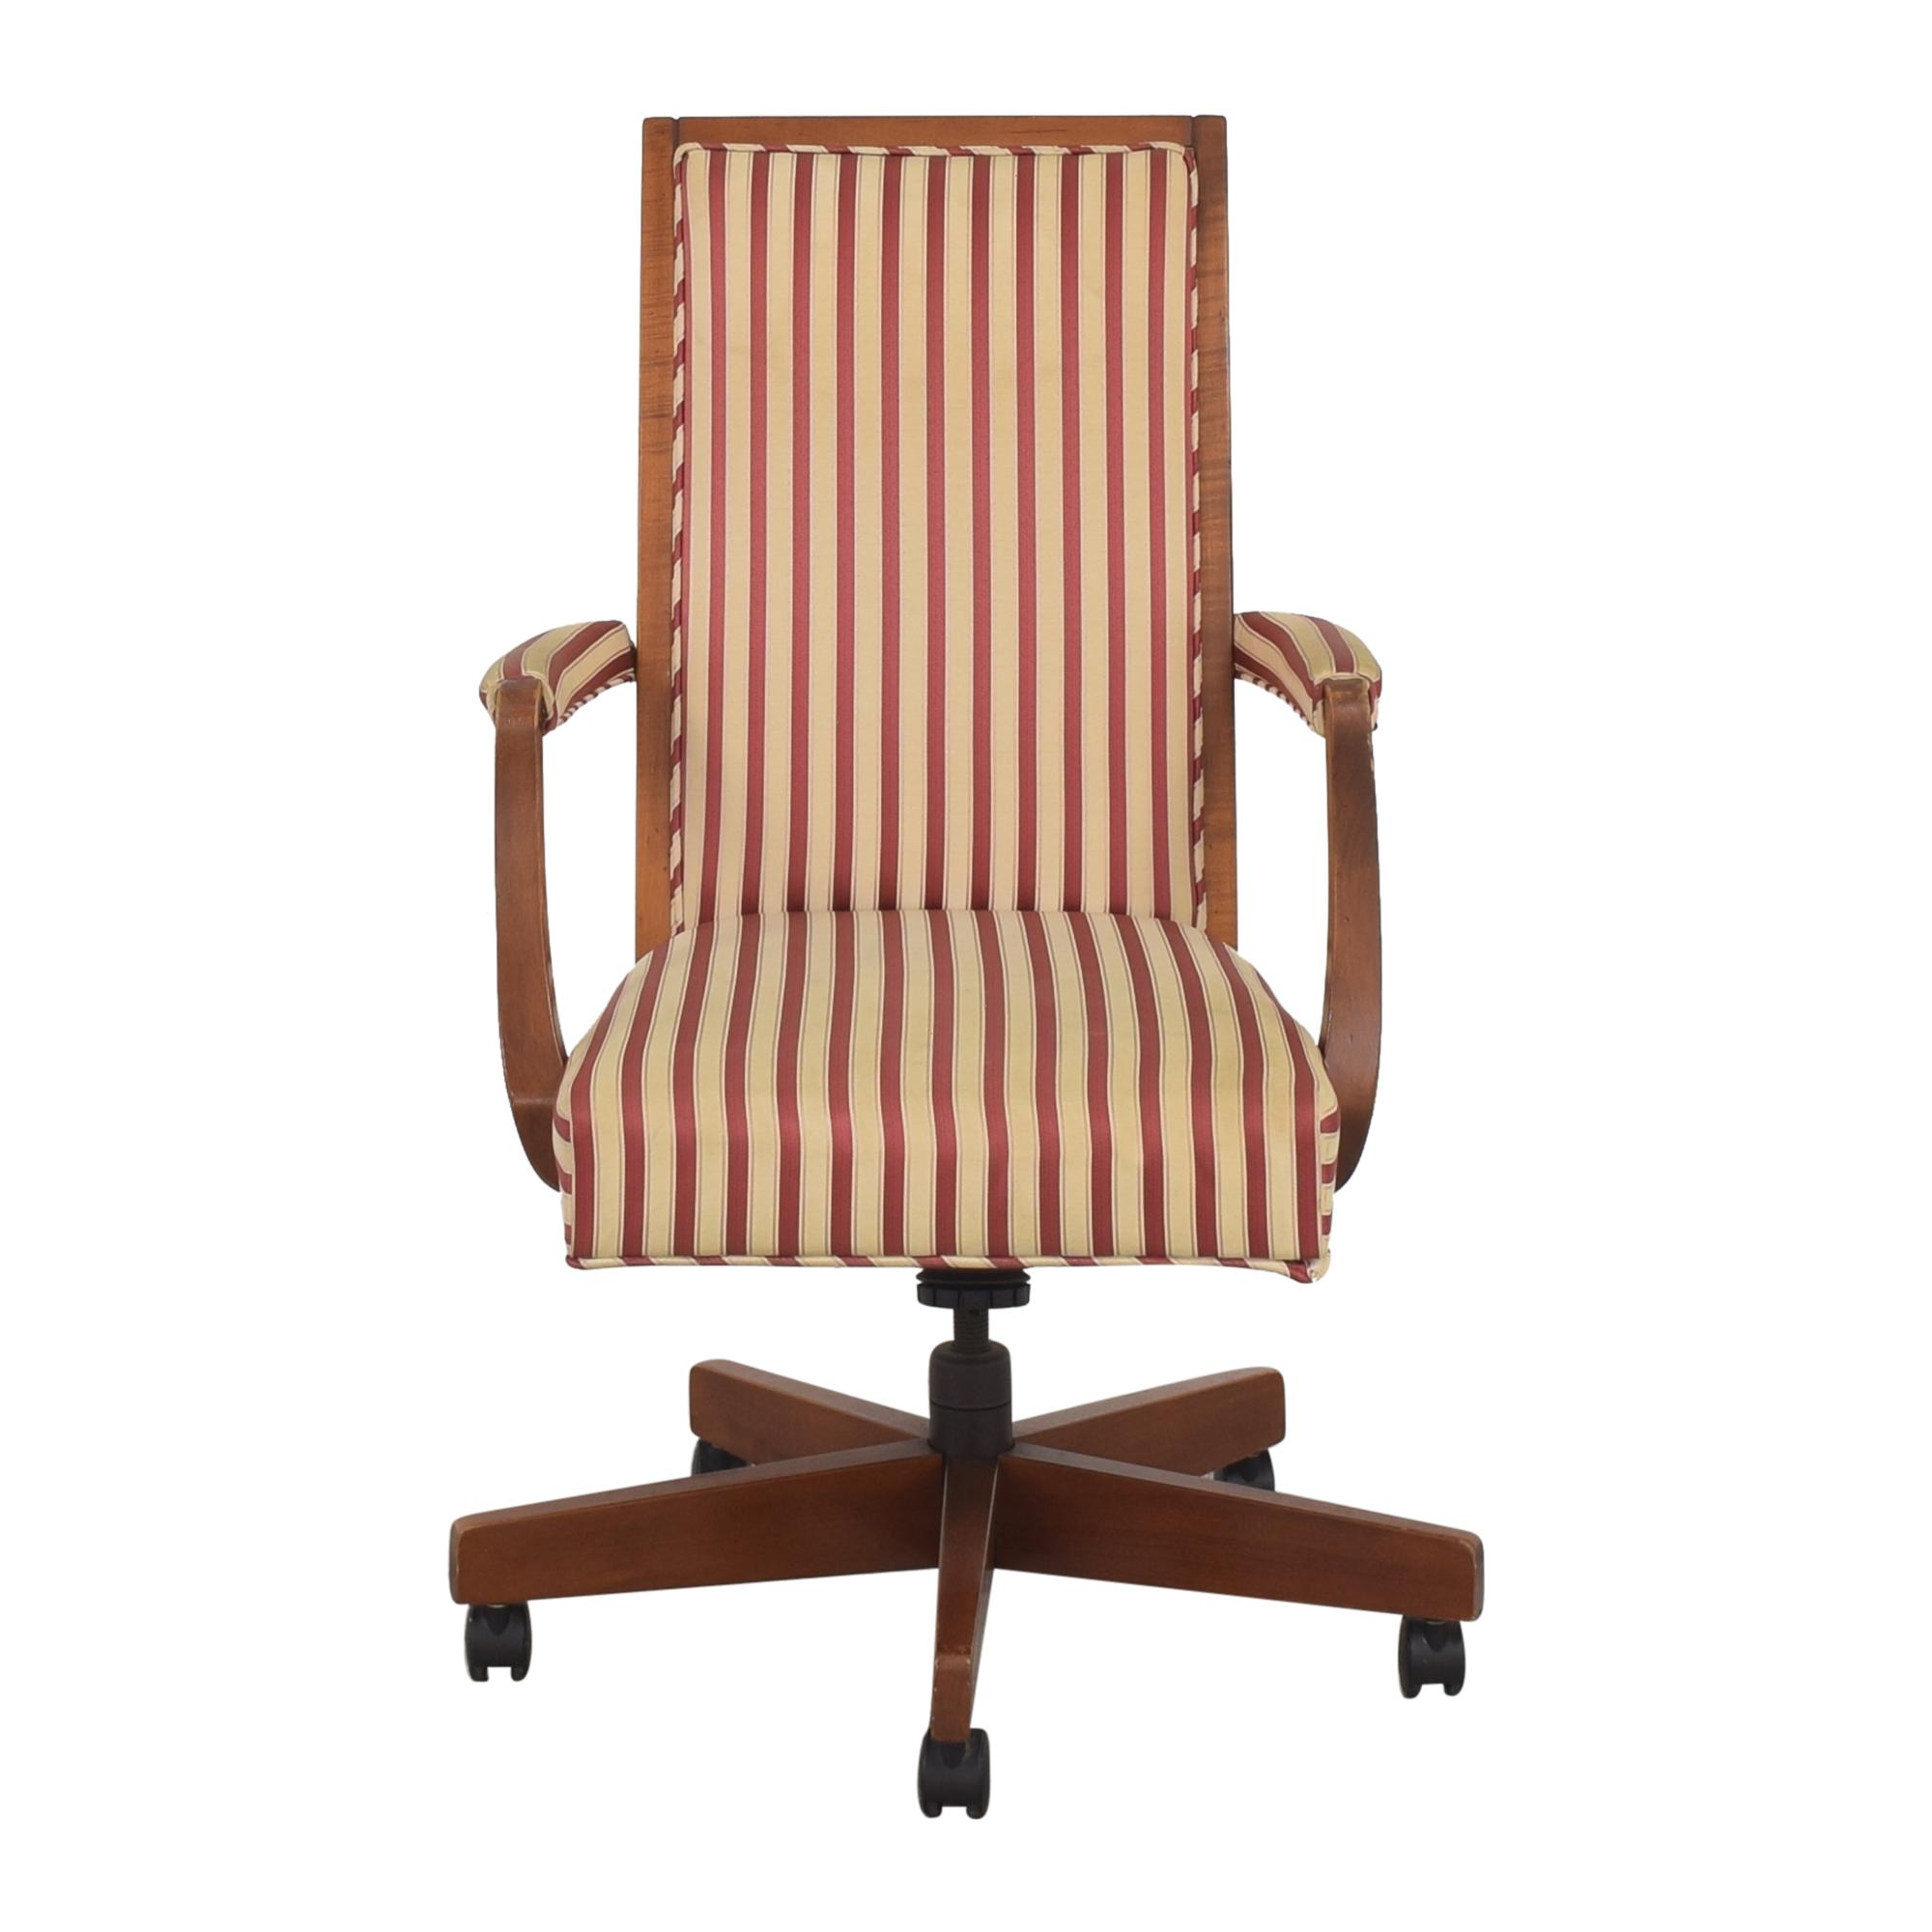 Ethan Allen Ethan Allen Stripe Upholstered Desk Chair second hand